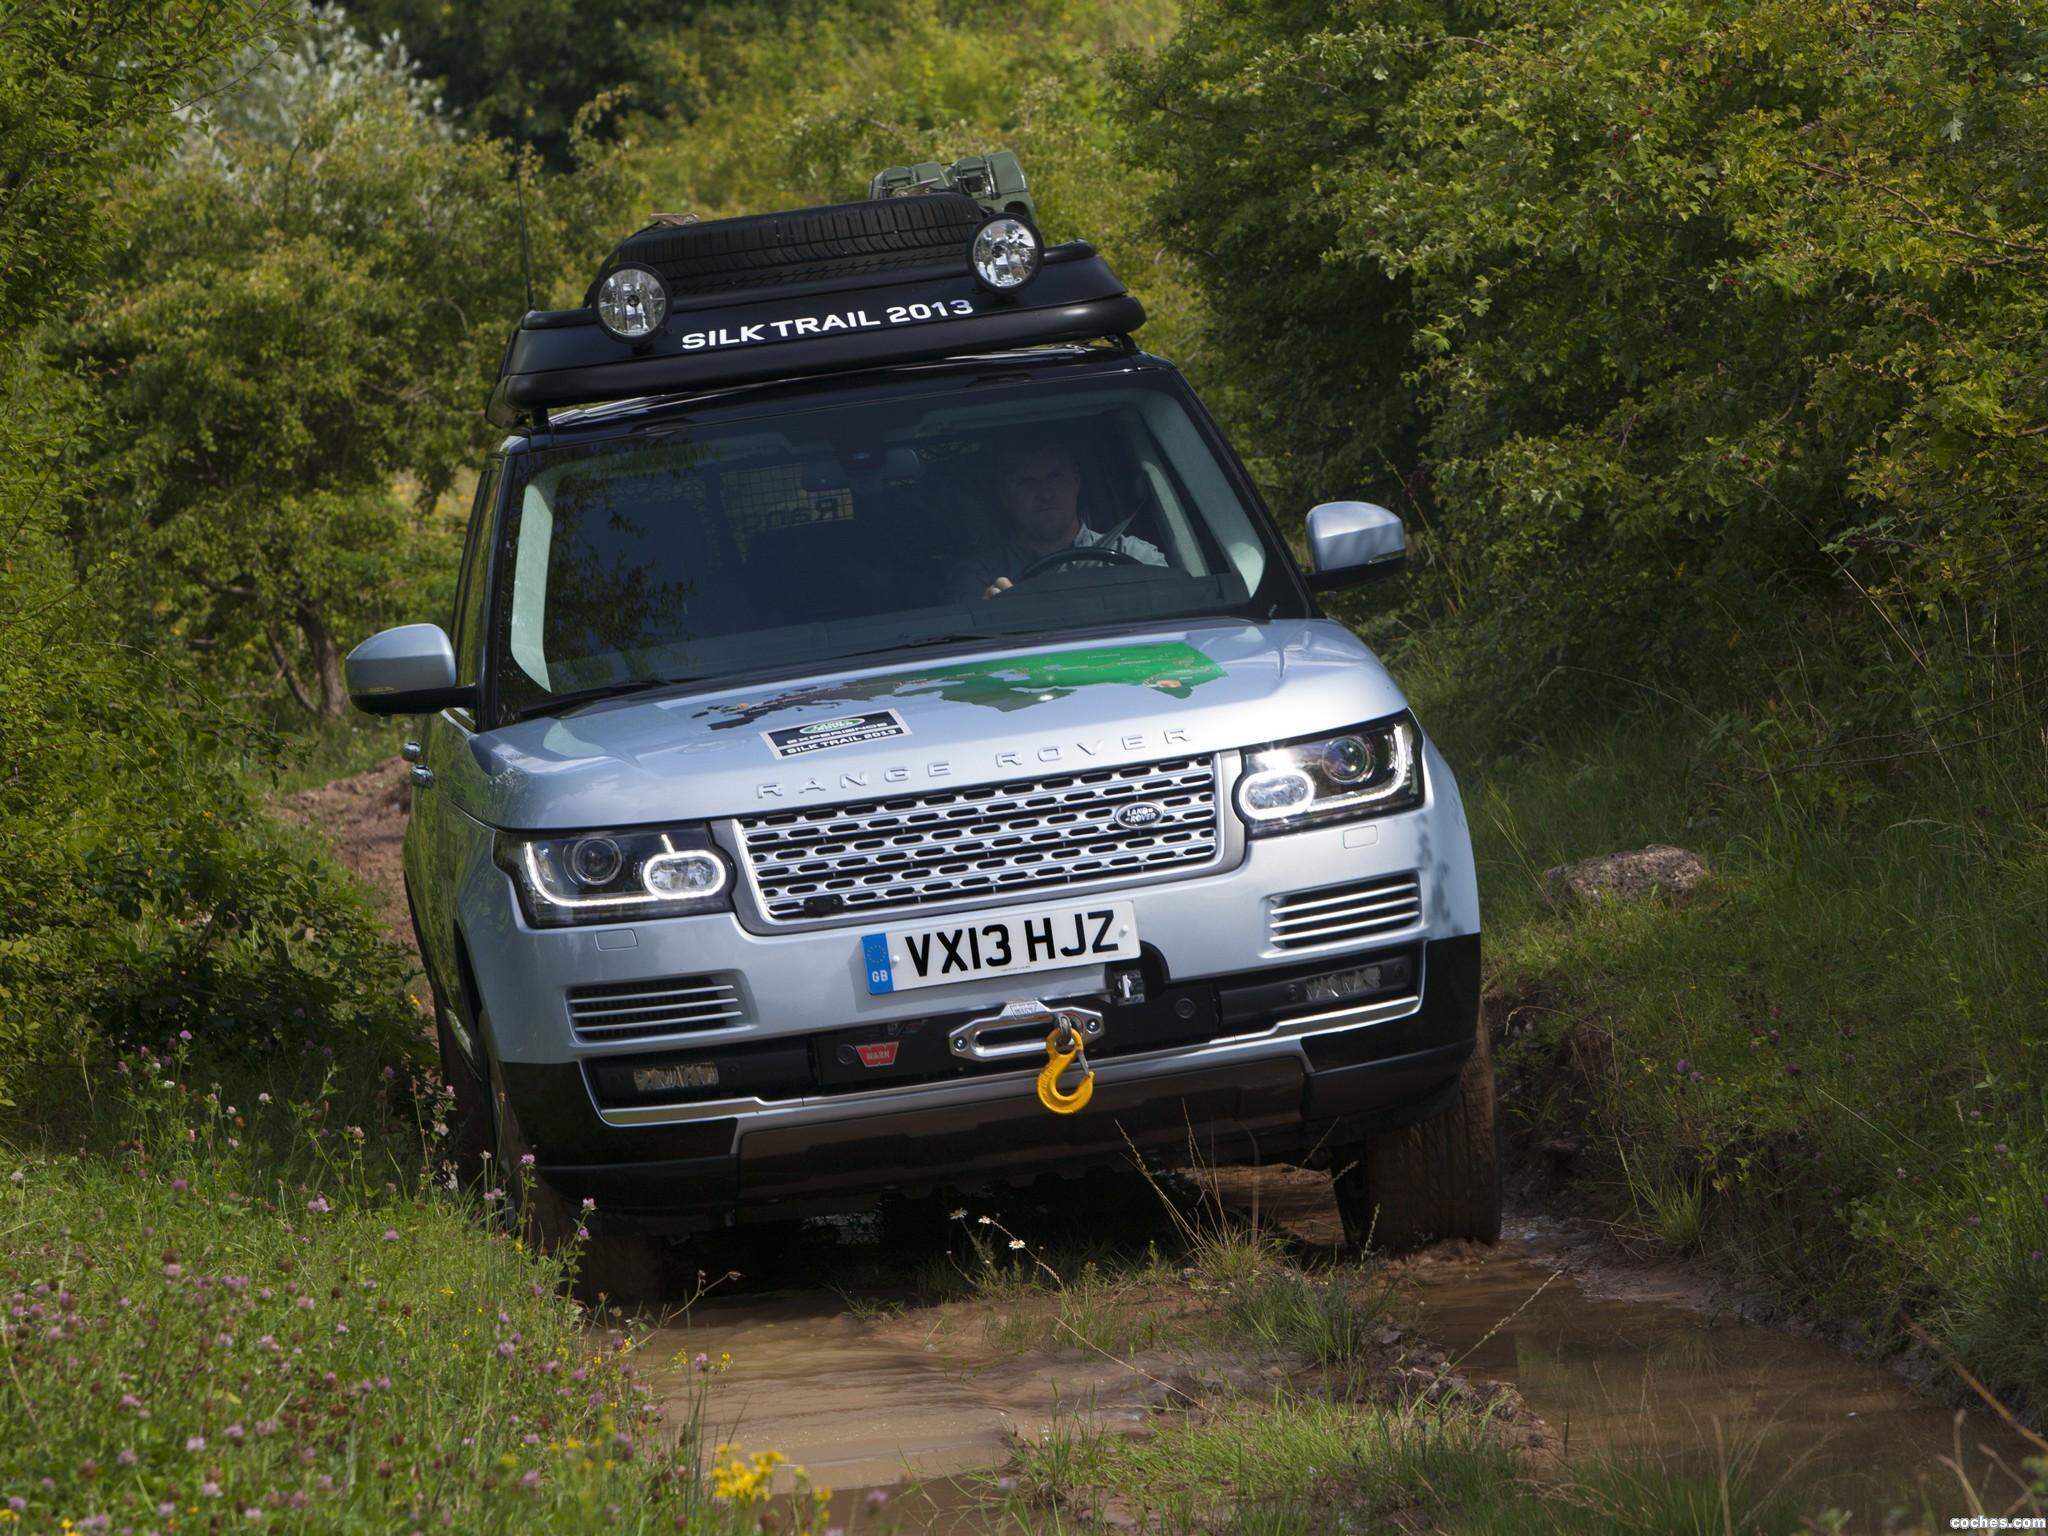 Foto 6 de Land Rover Range Rover Hybrid Prototype L405 2013